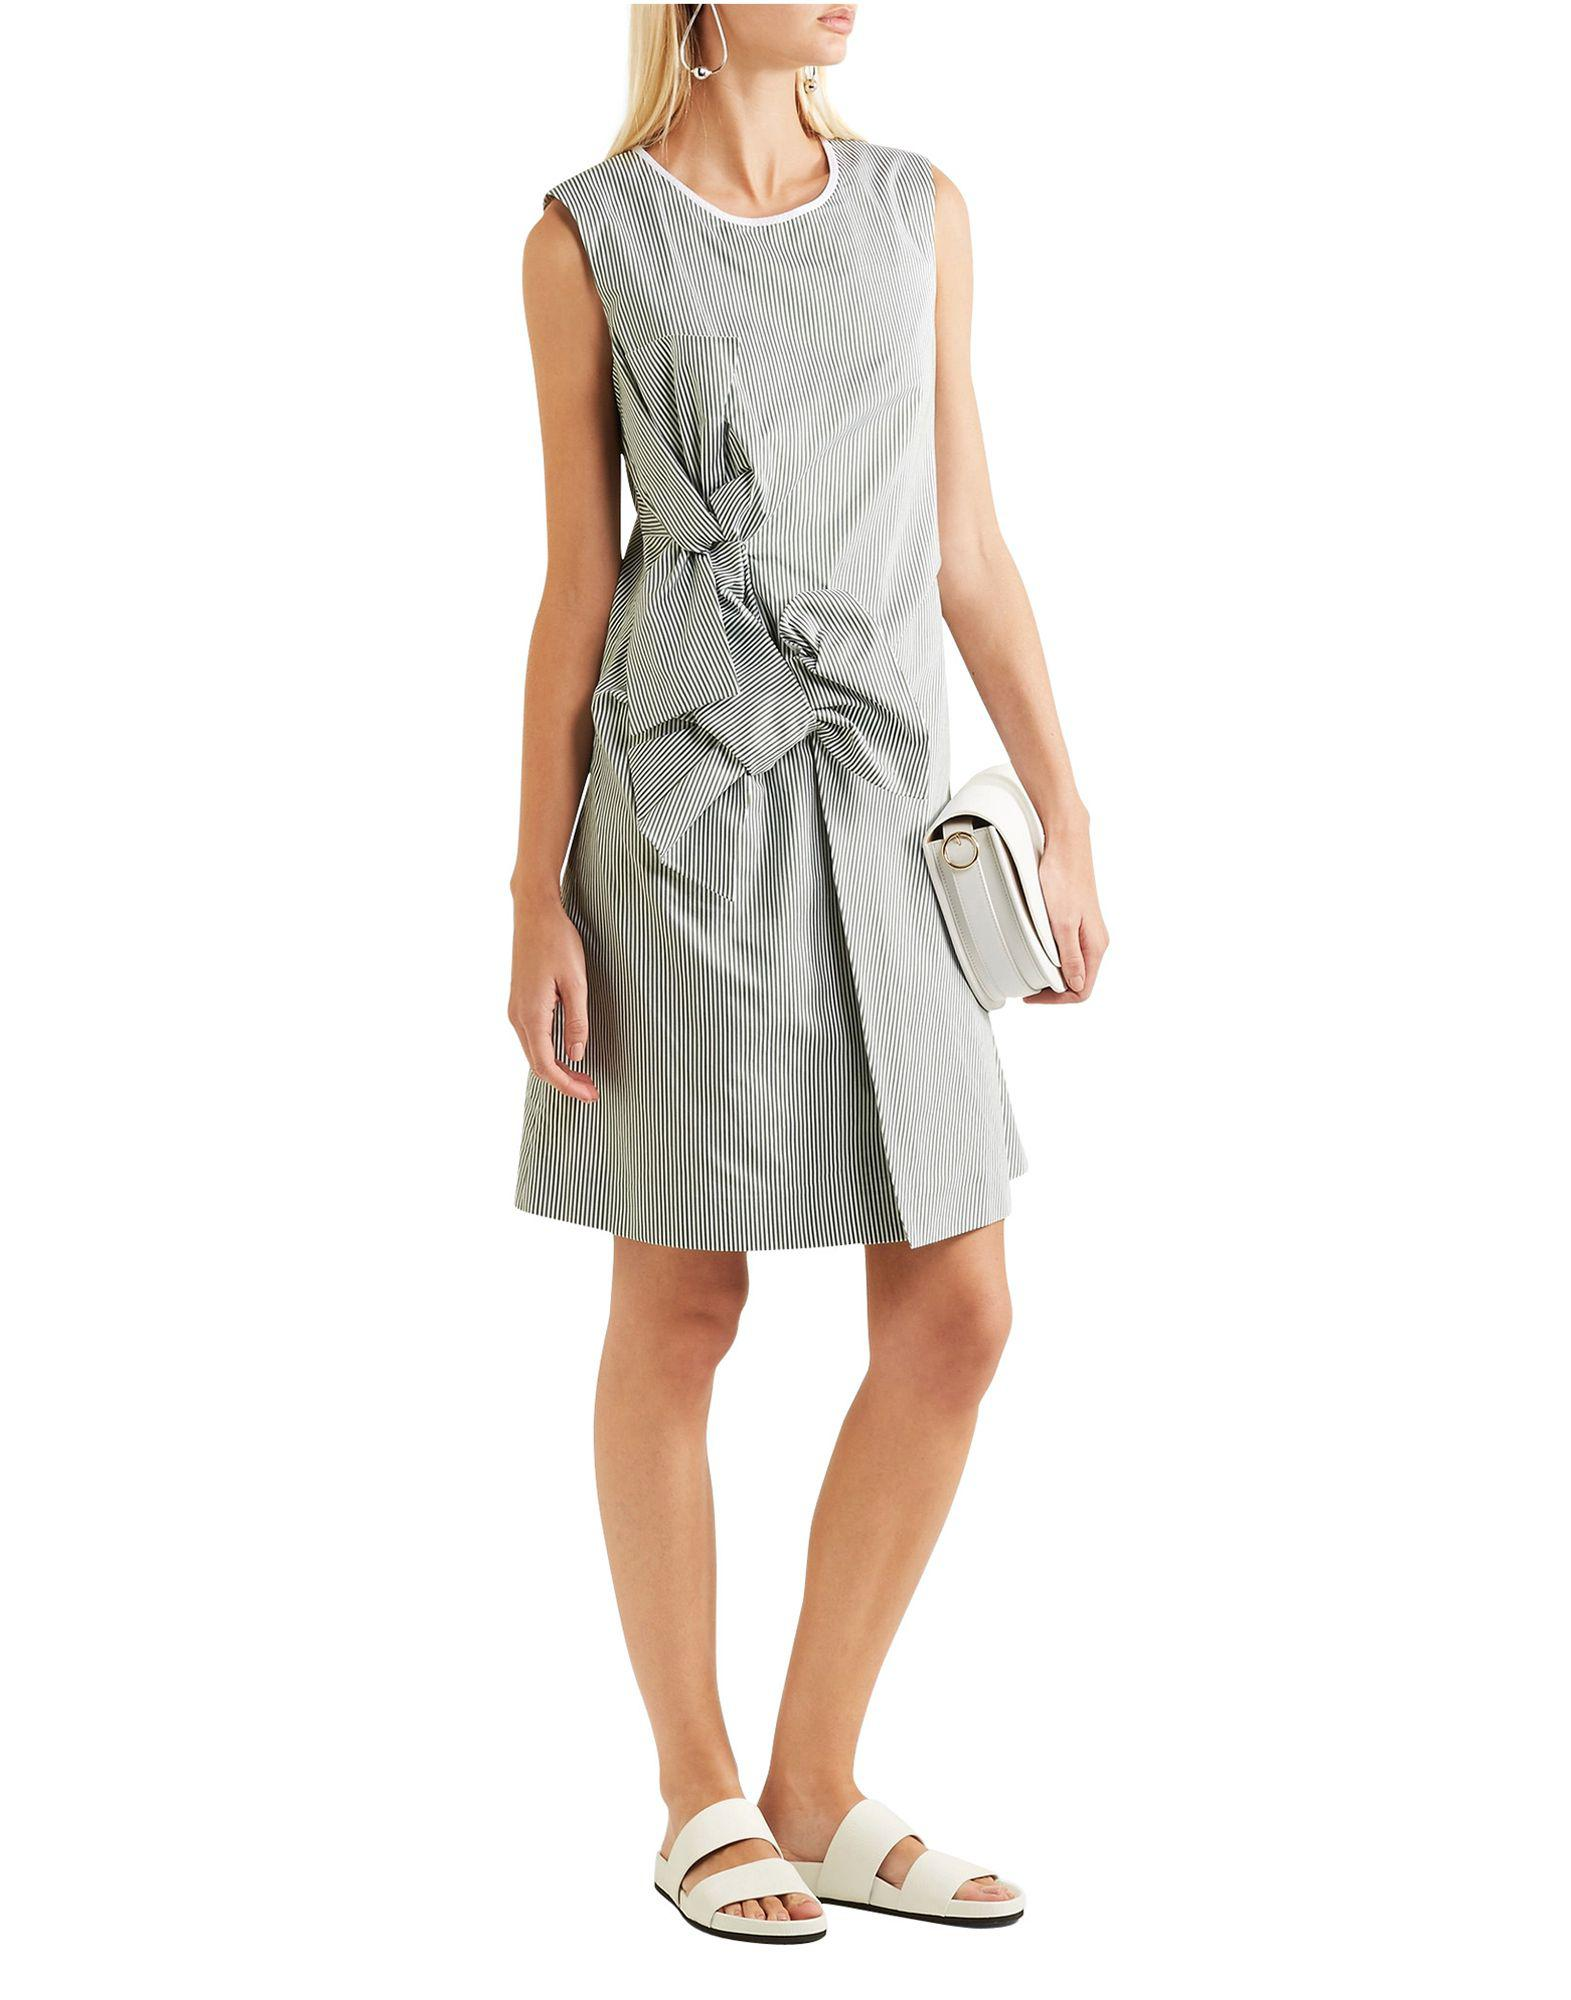 df0925b787be Victoria, Victoria Beckham Short Dress in Green - Save 47% - Lyst